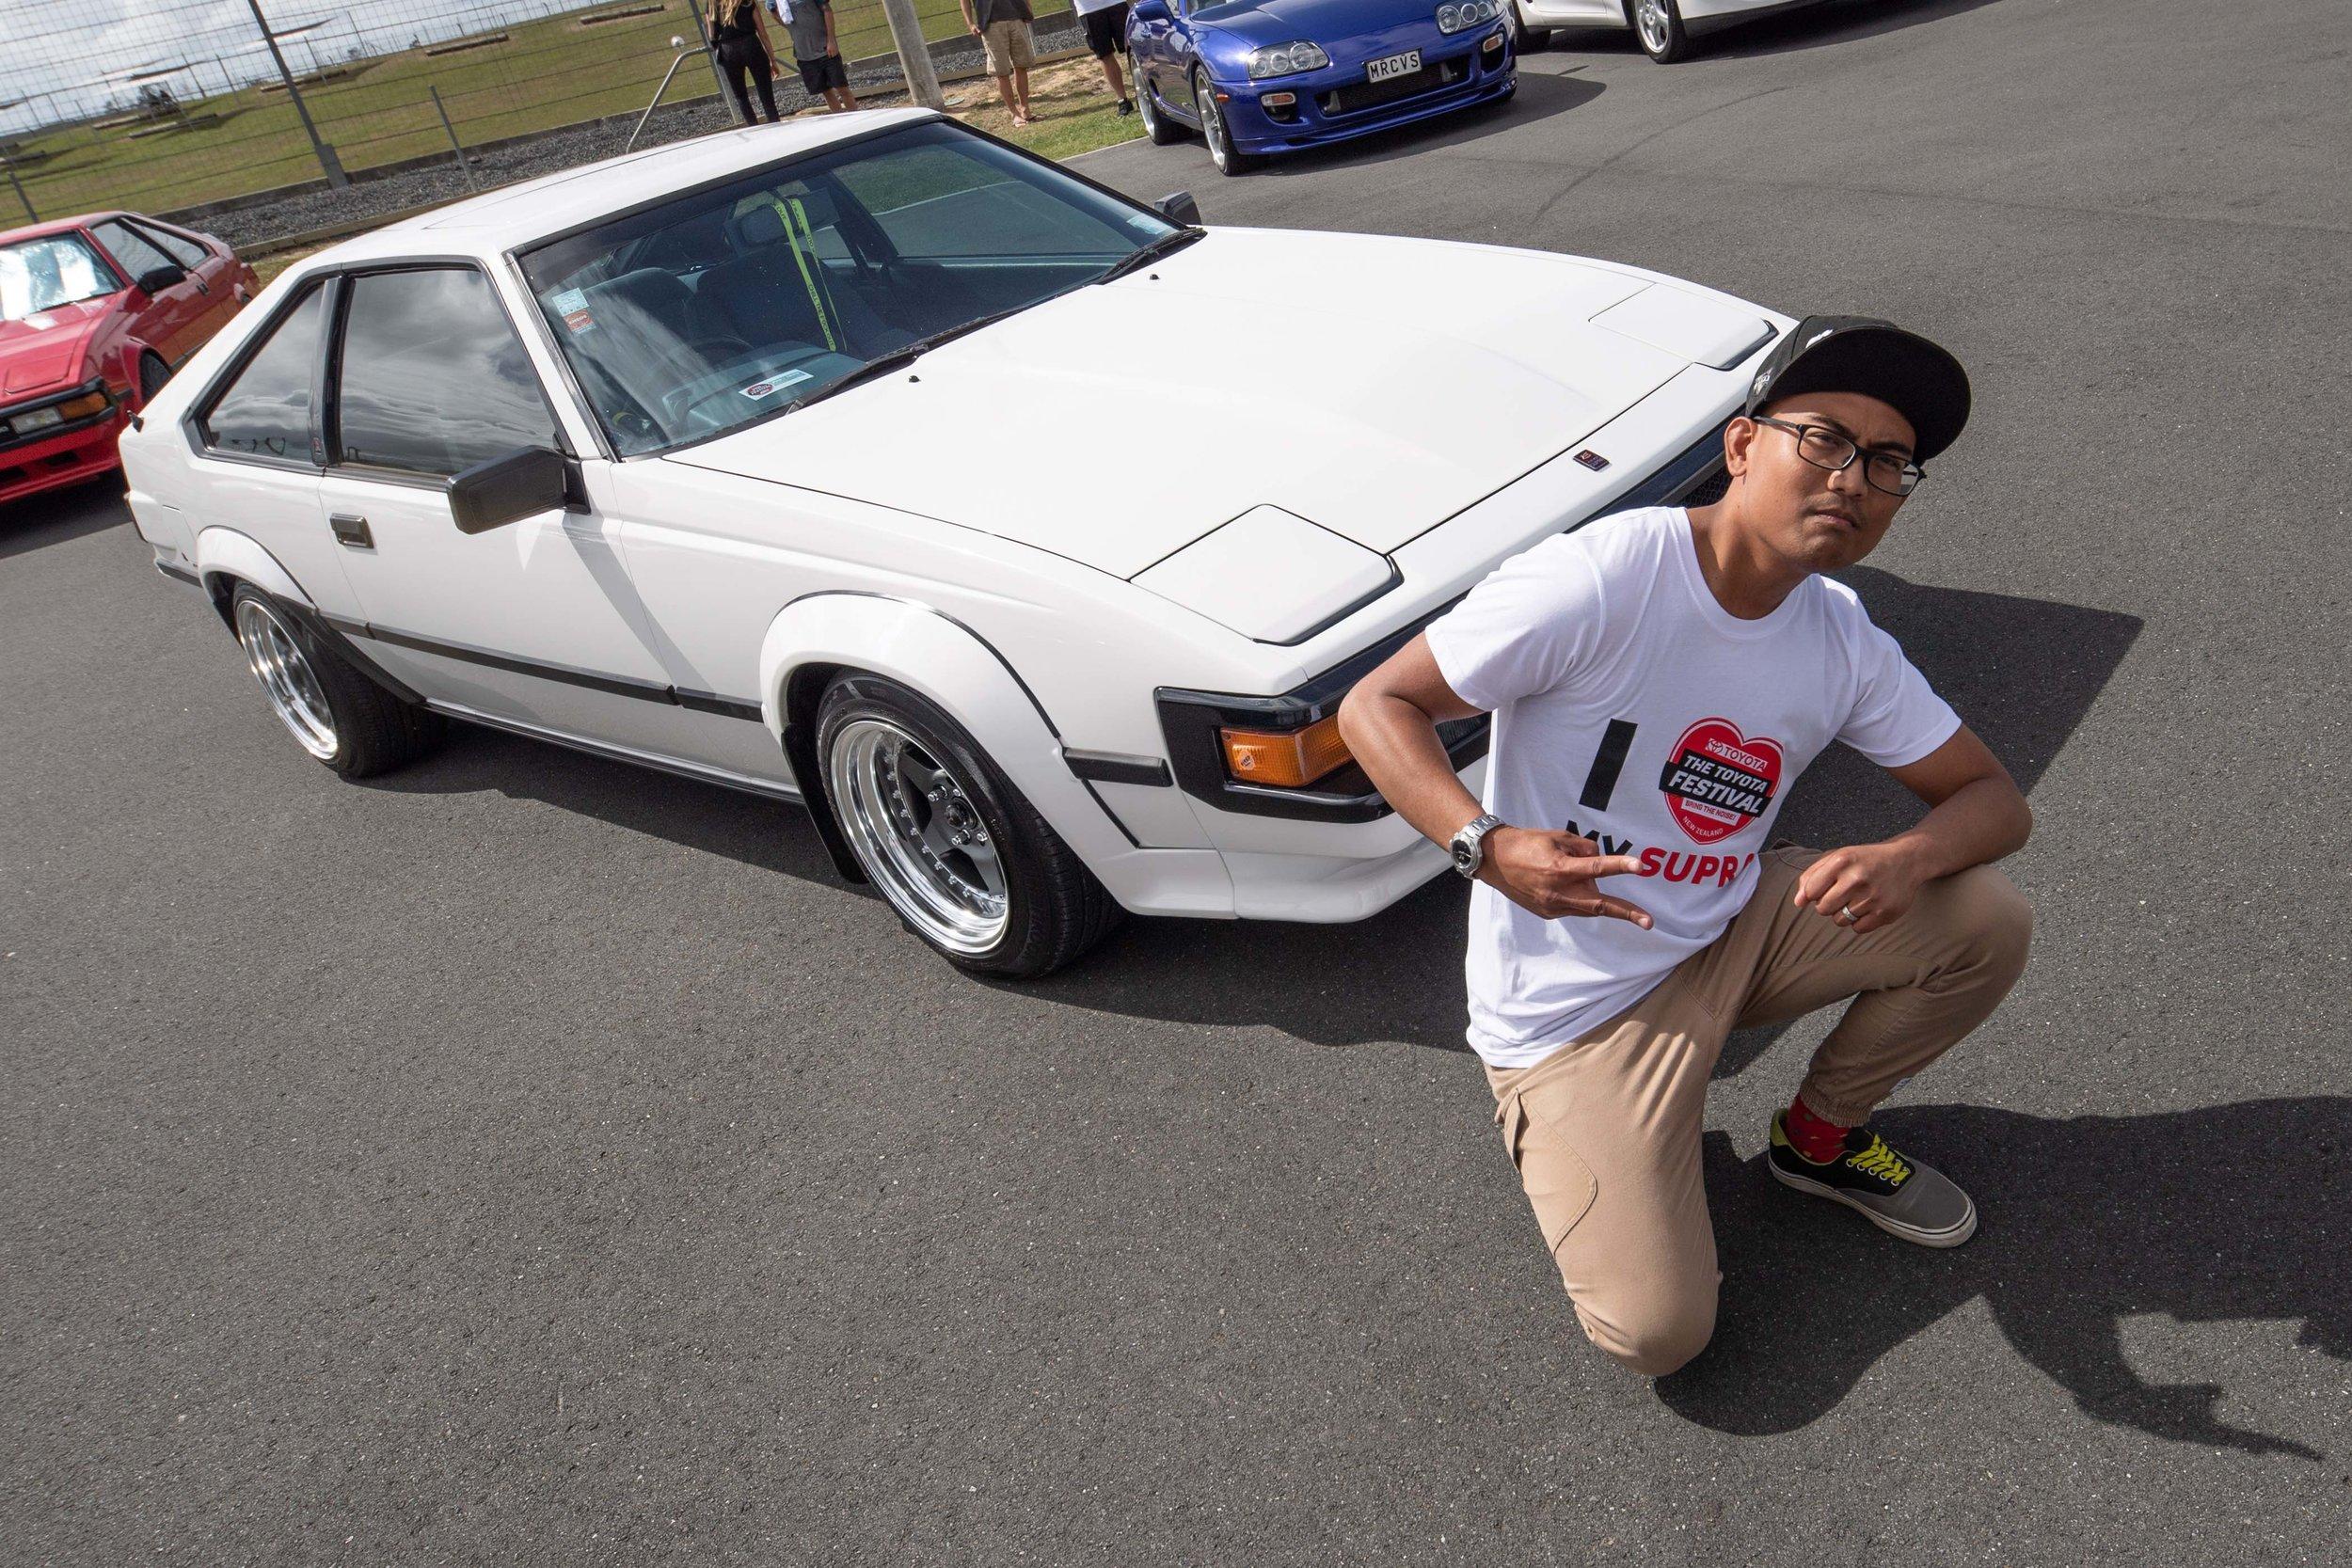 Supra at the Toyota Festival (002).jpg